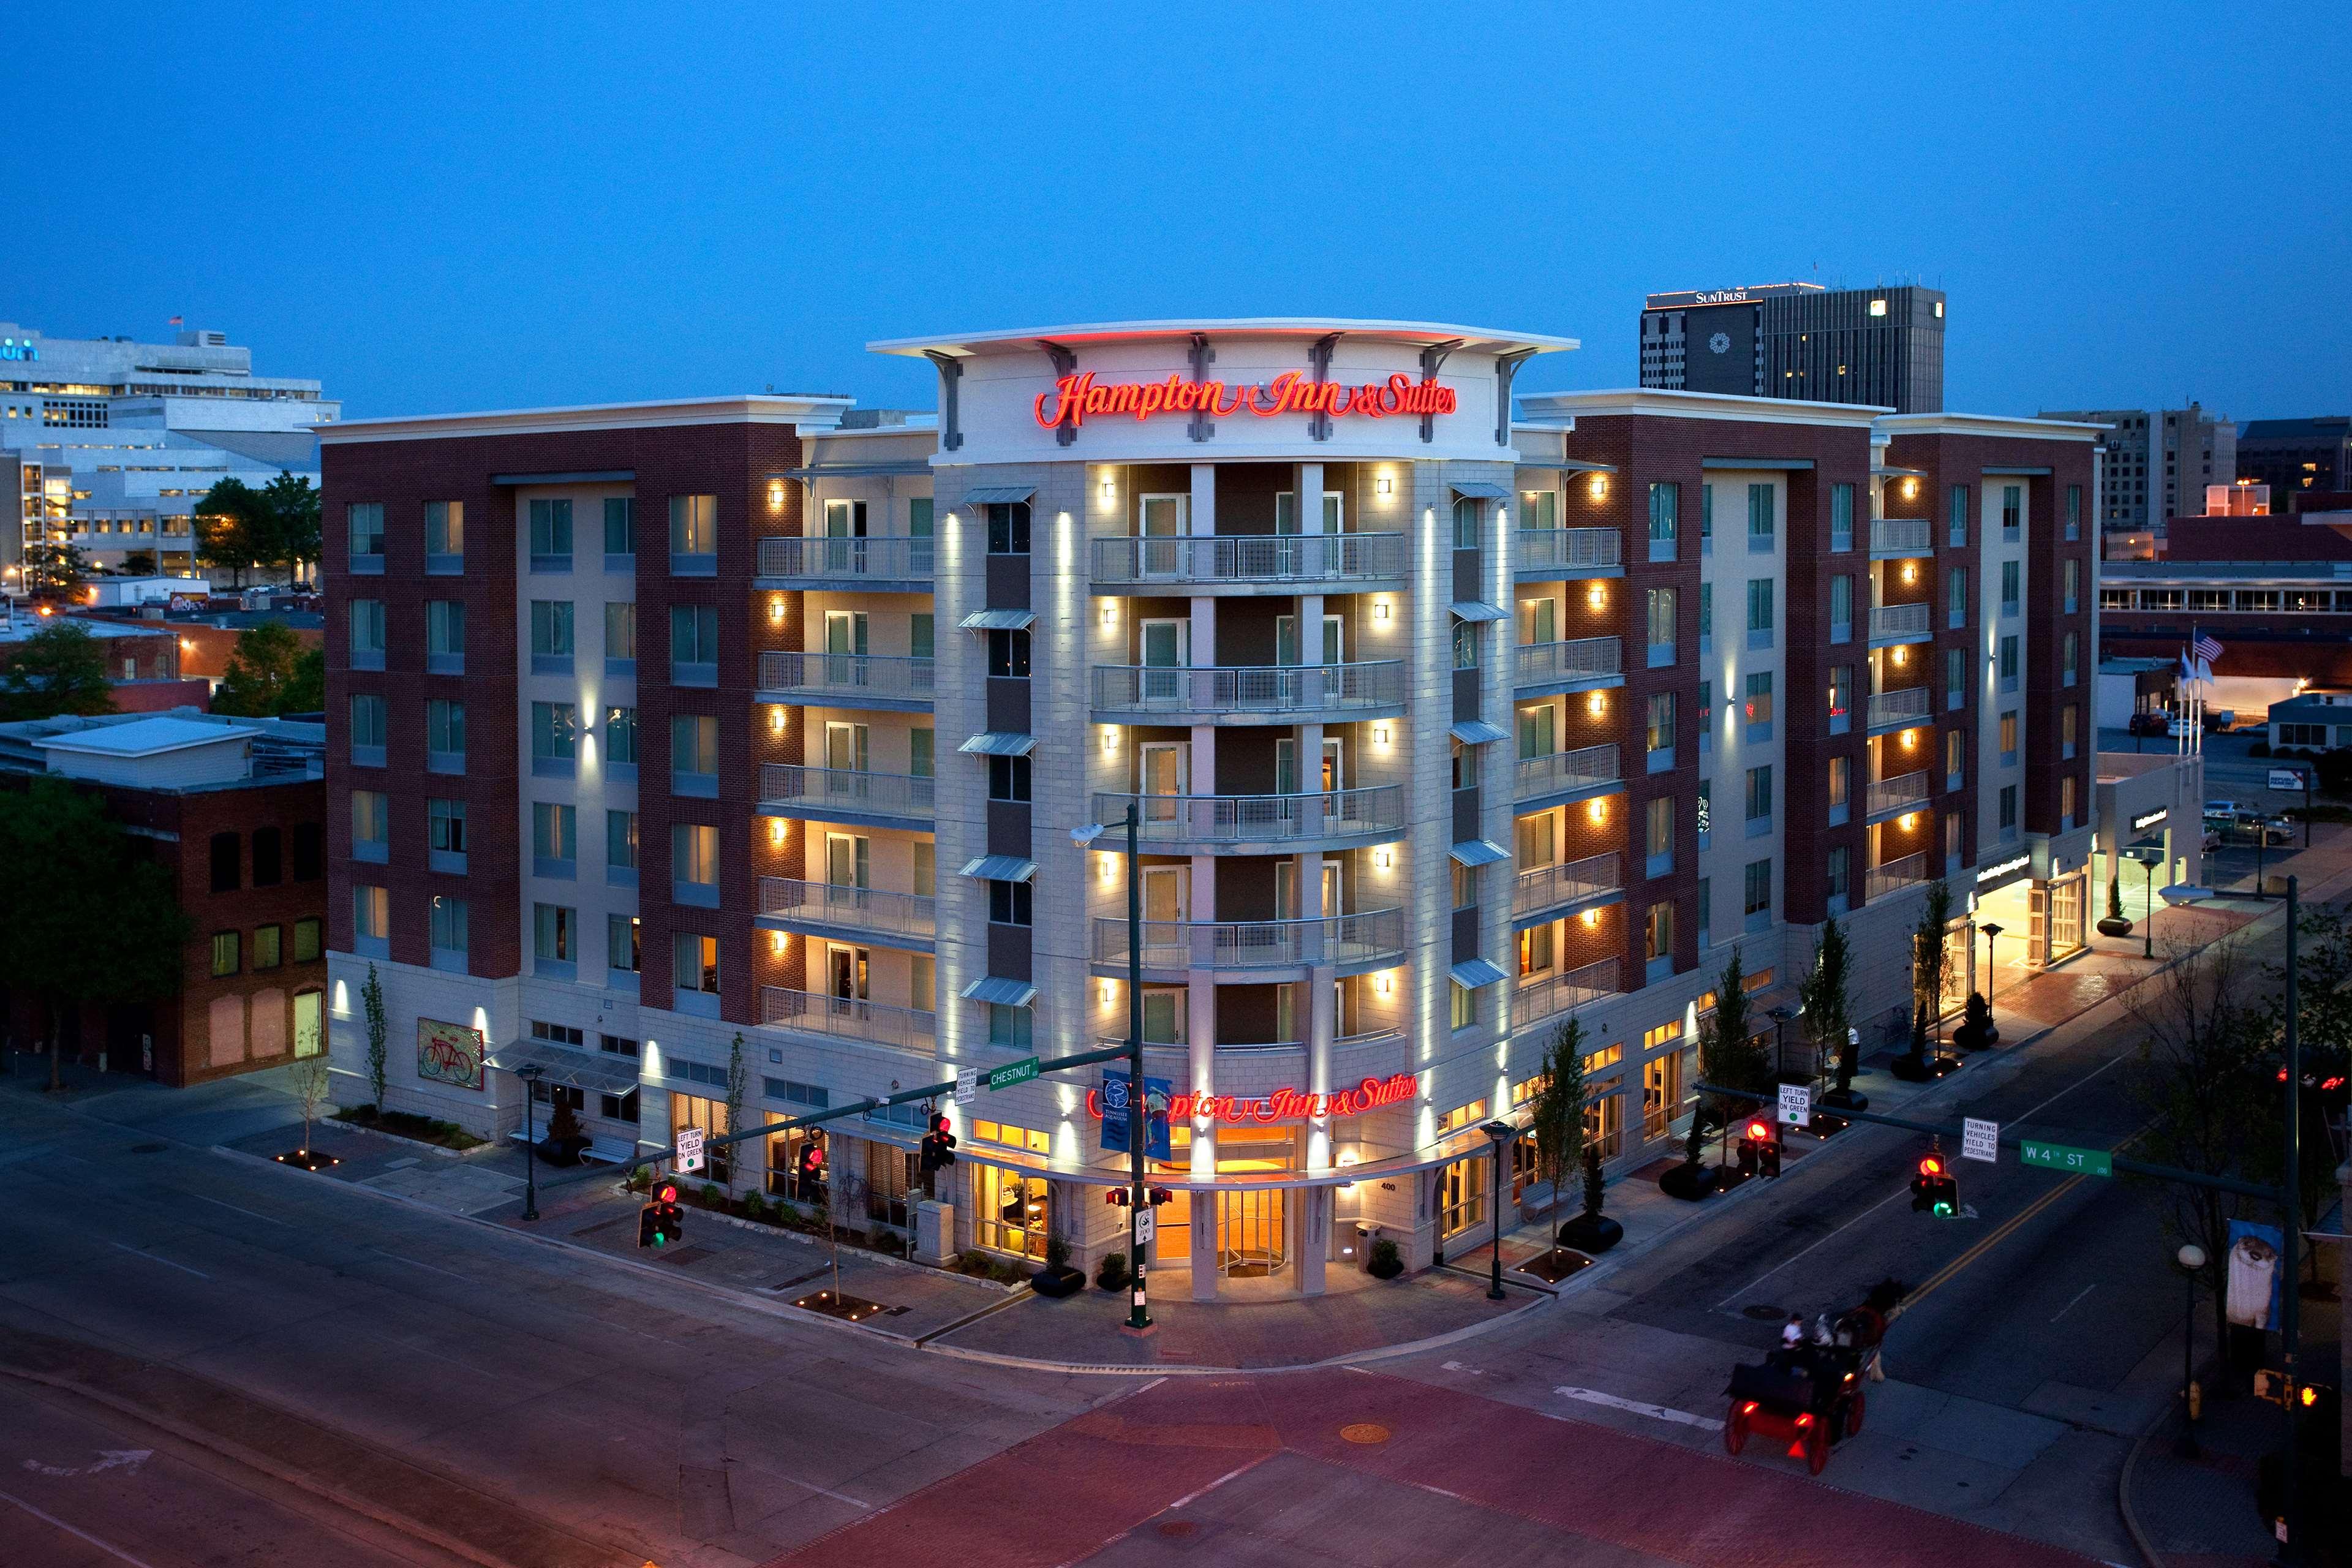 Hampton Inn & Suites Chattanooga/Downtown